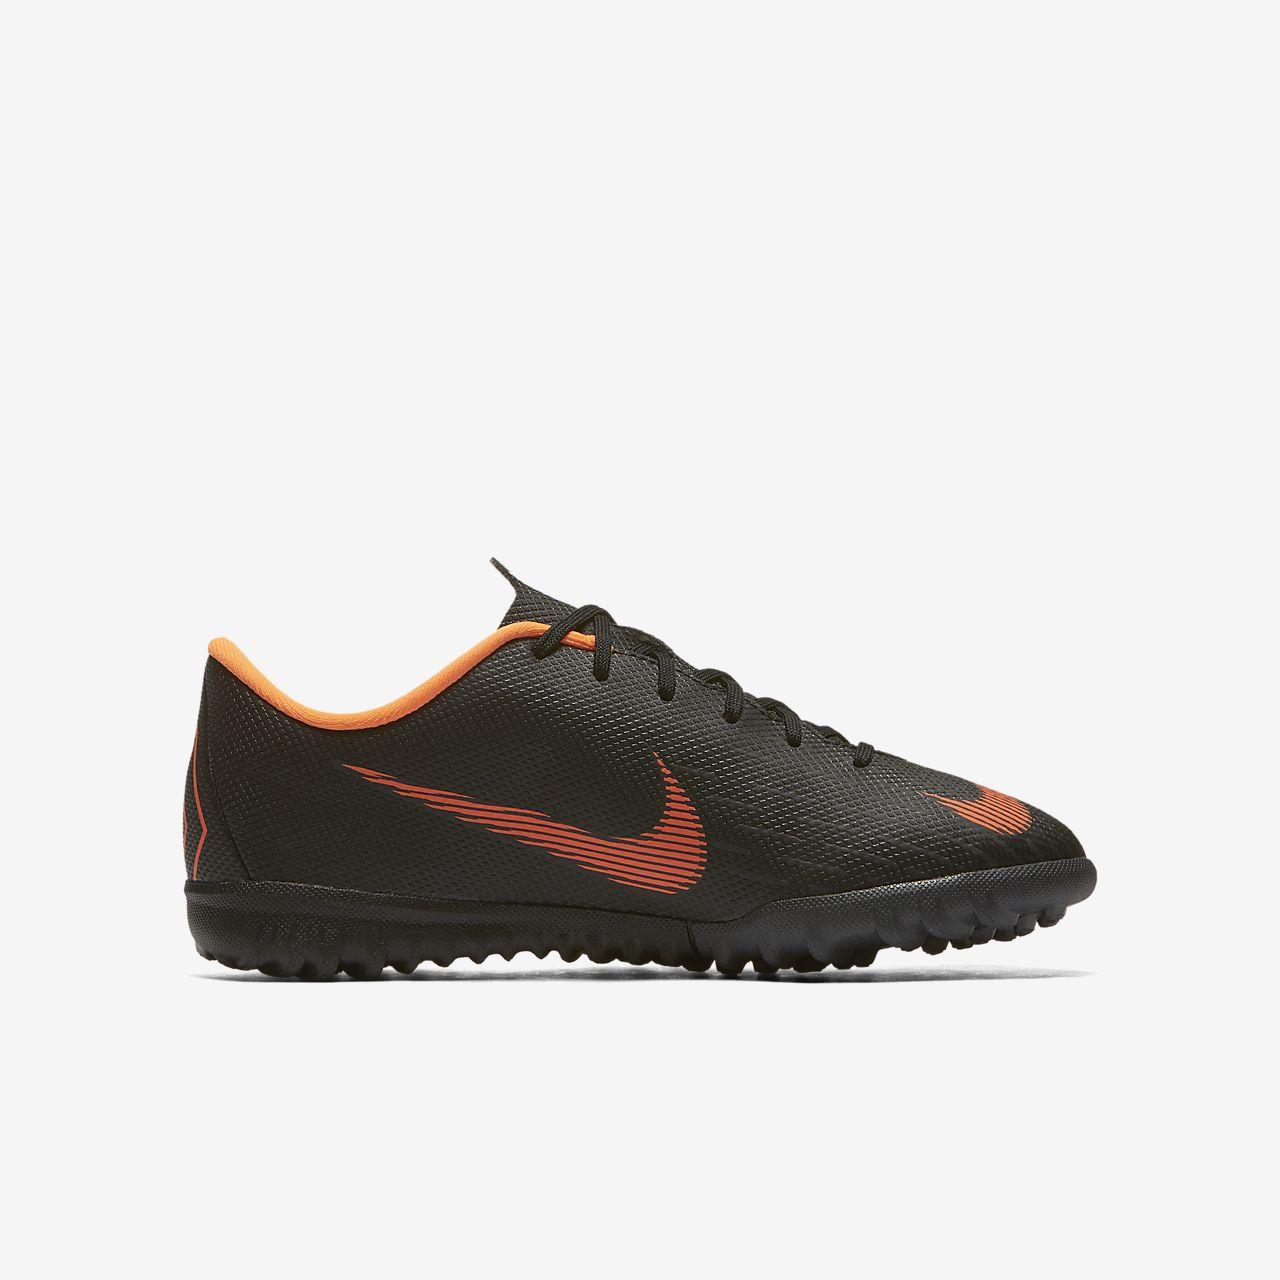 ... Nike Jr. MercurialX Vapor XII Academy Younger/Older Kids' Turf Football  Shoe